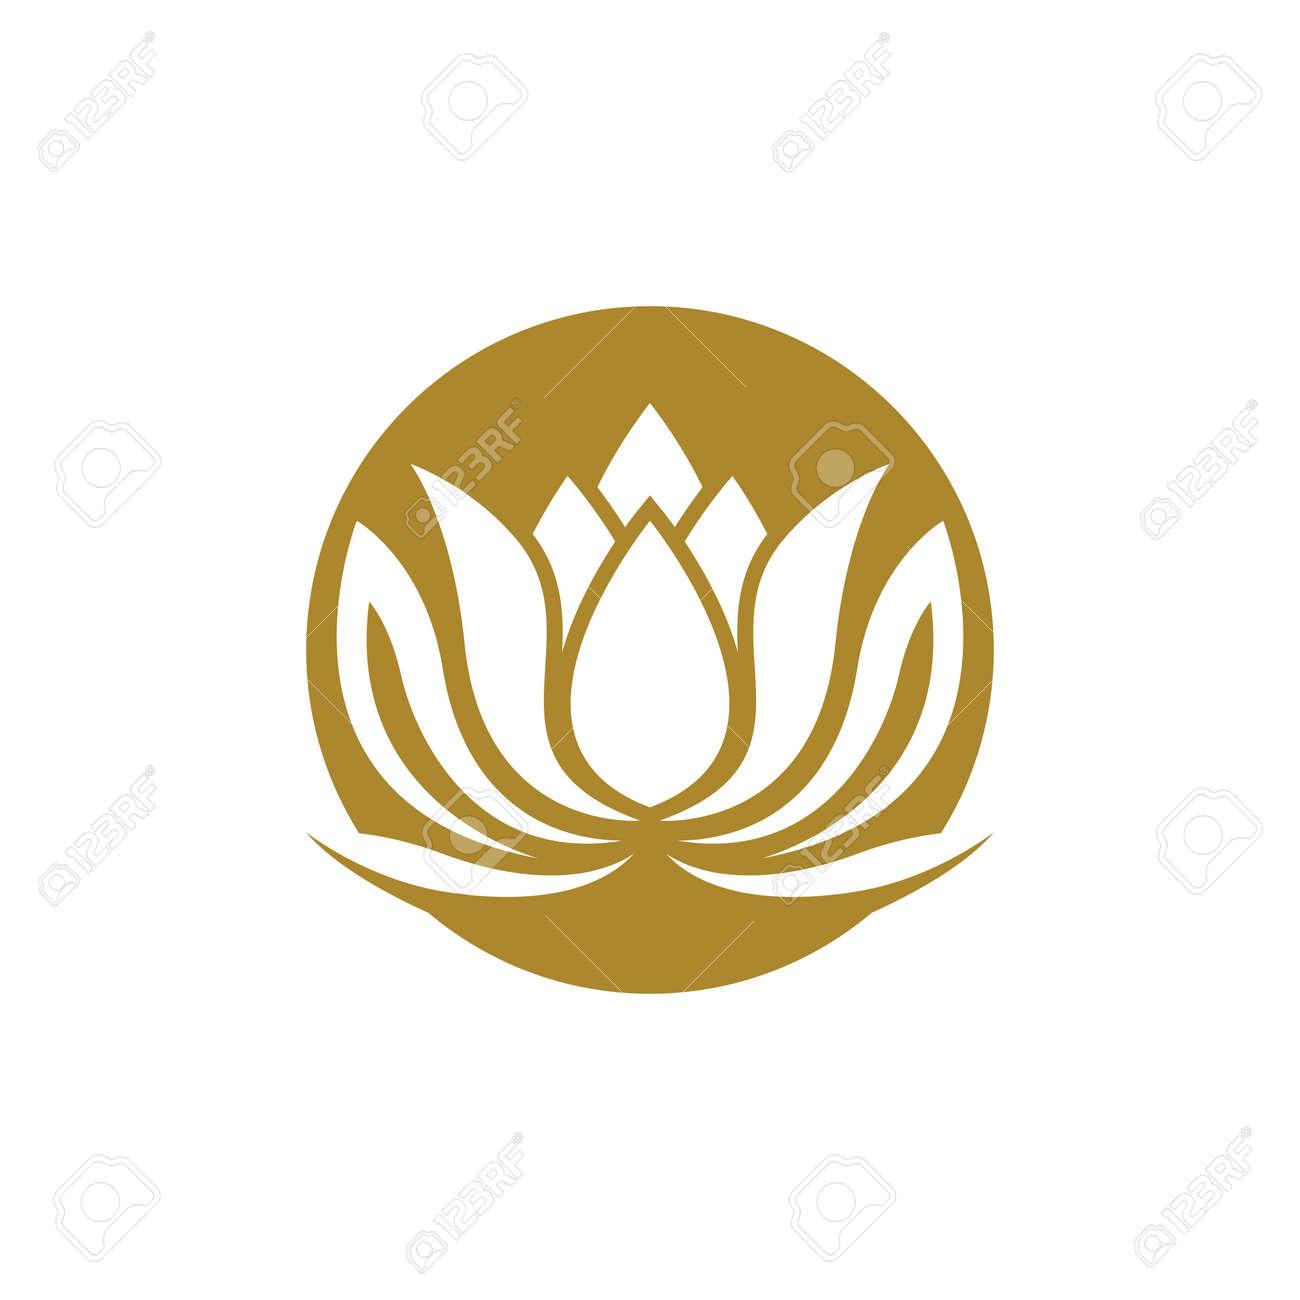 Beauty lotus logo images illustration design - 167448487